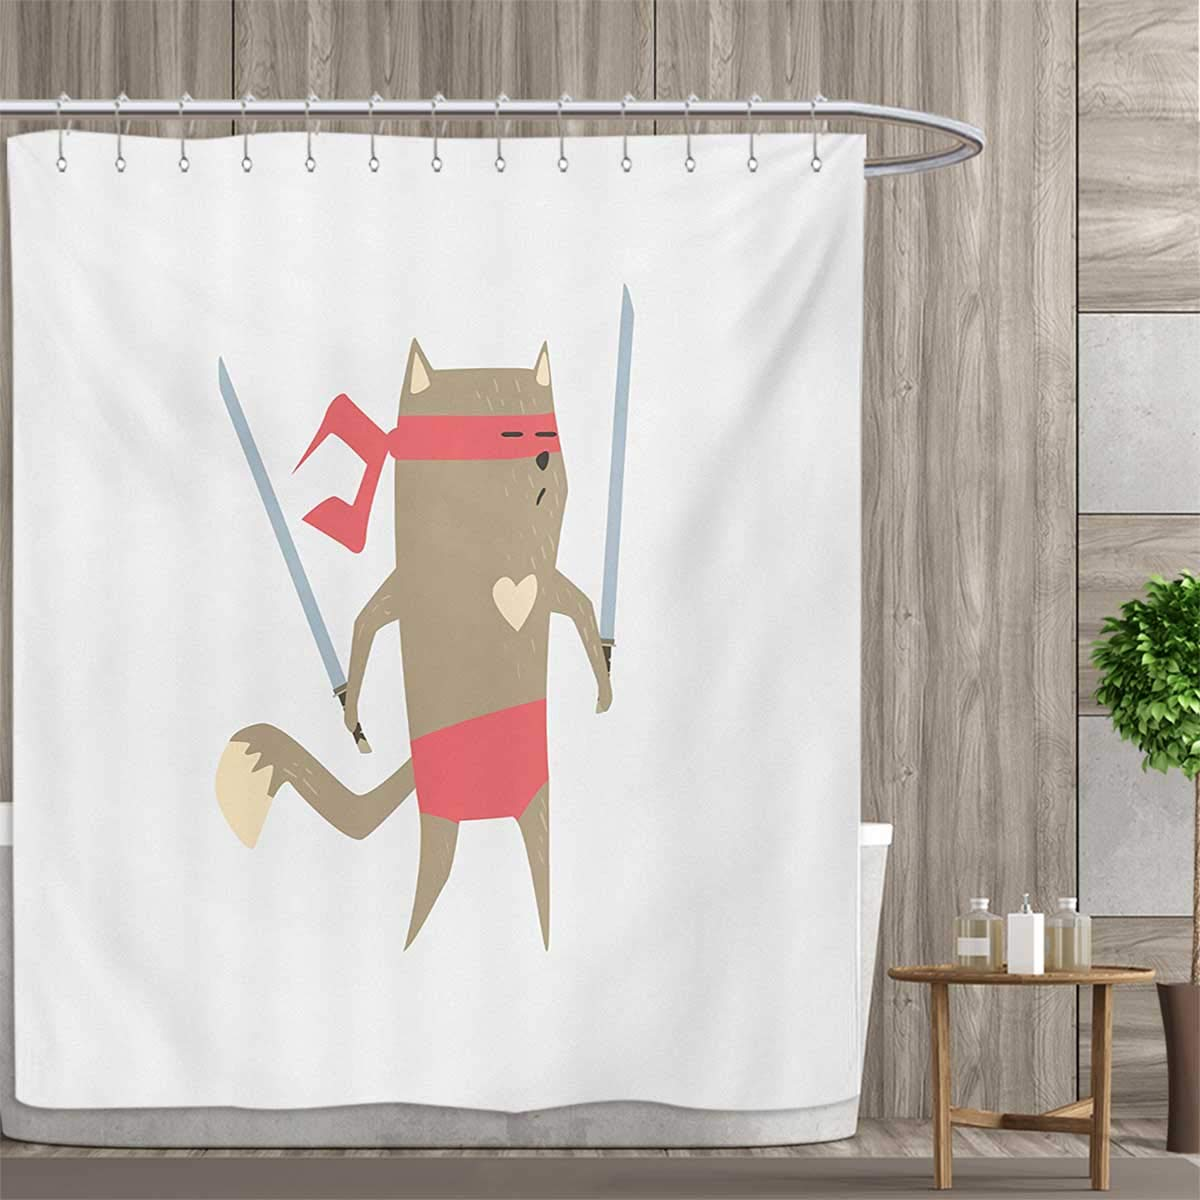 Amazon.com: smallfly Japanese Shower Curtains Fabric Crime ...